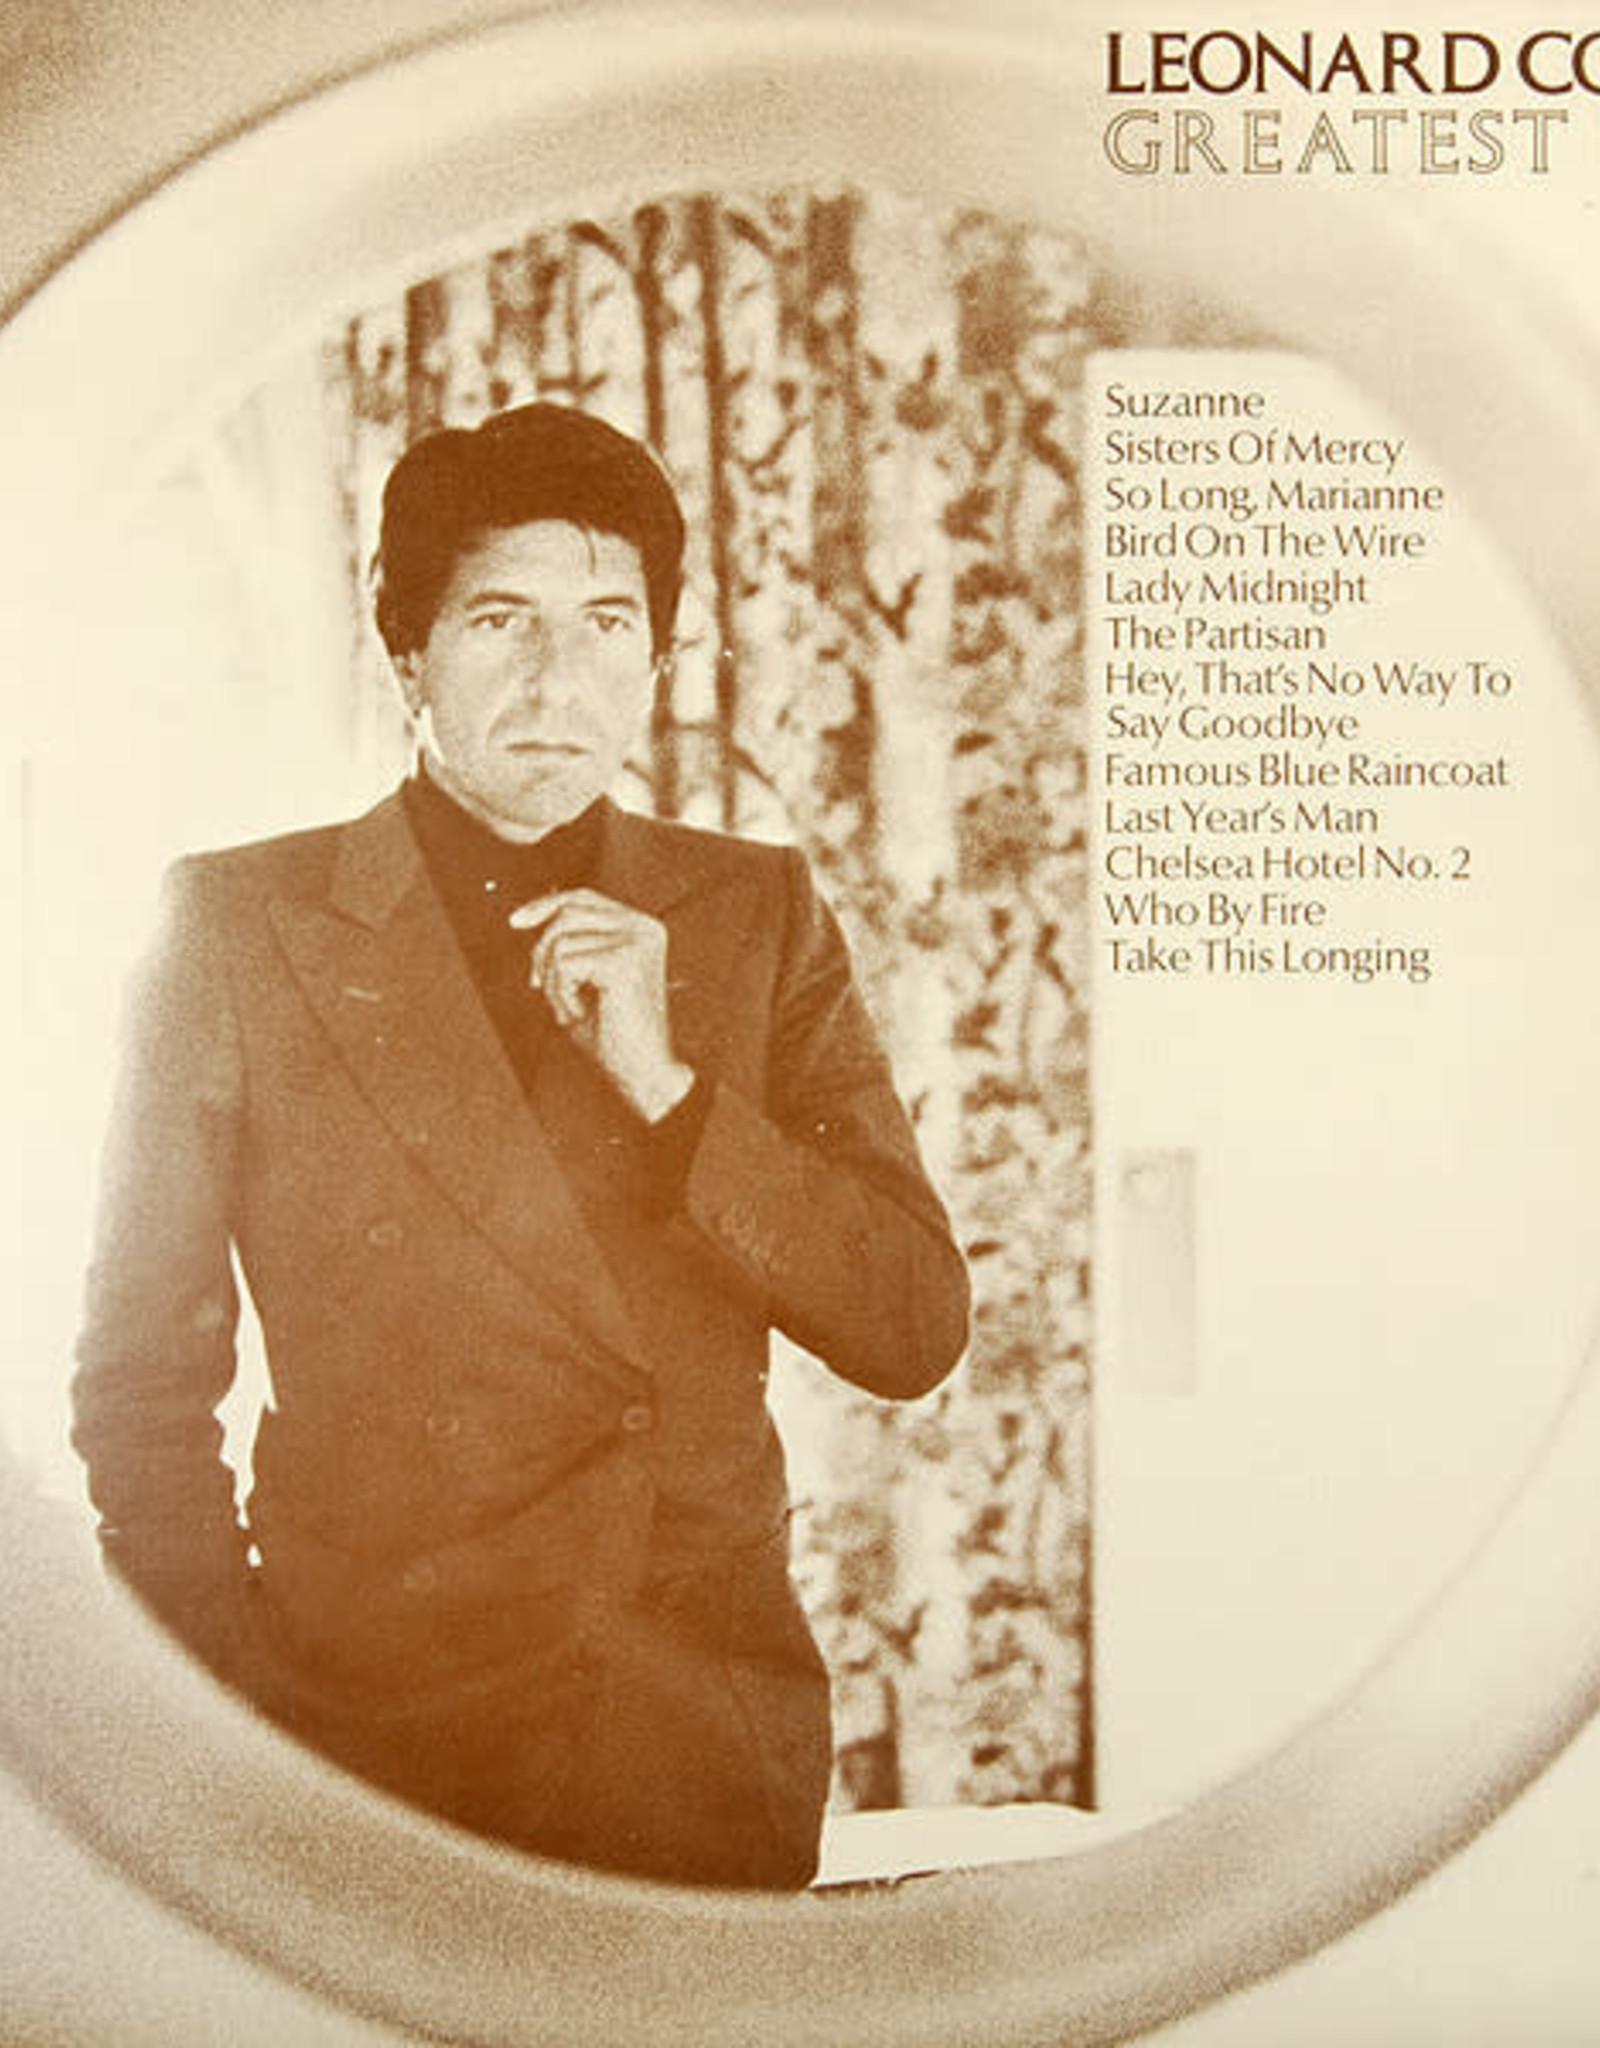 Leonard Cohen - Greatest Hits (150G/Dl Card)